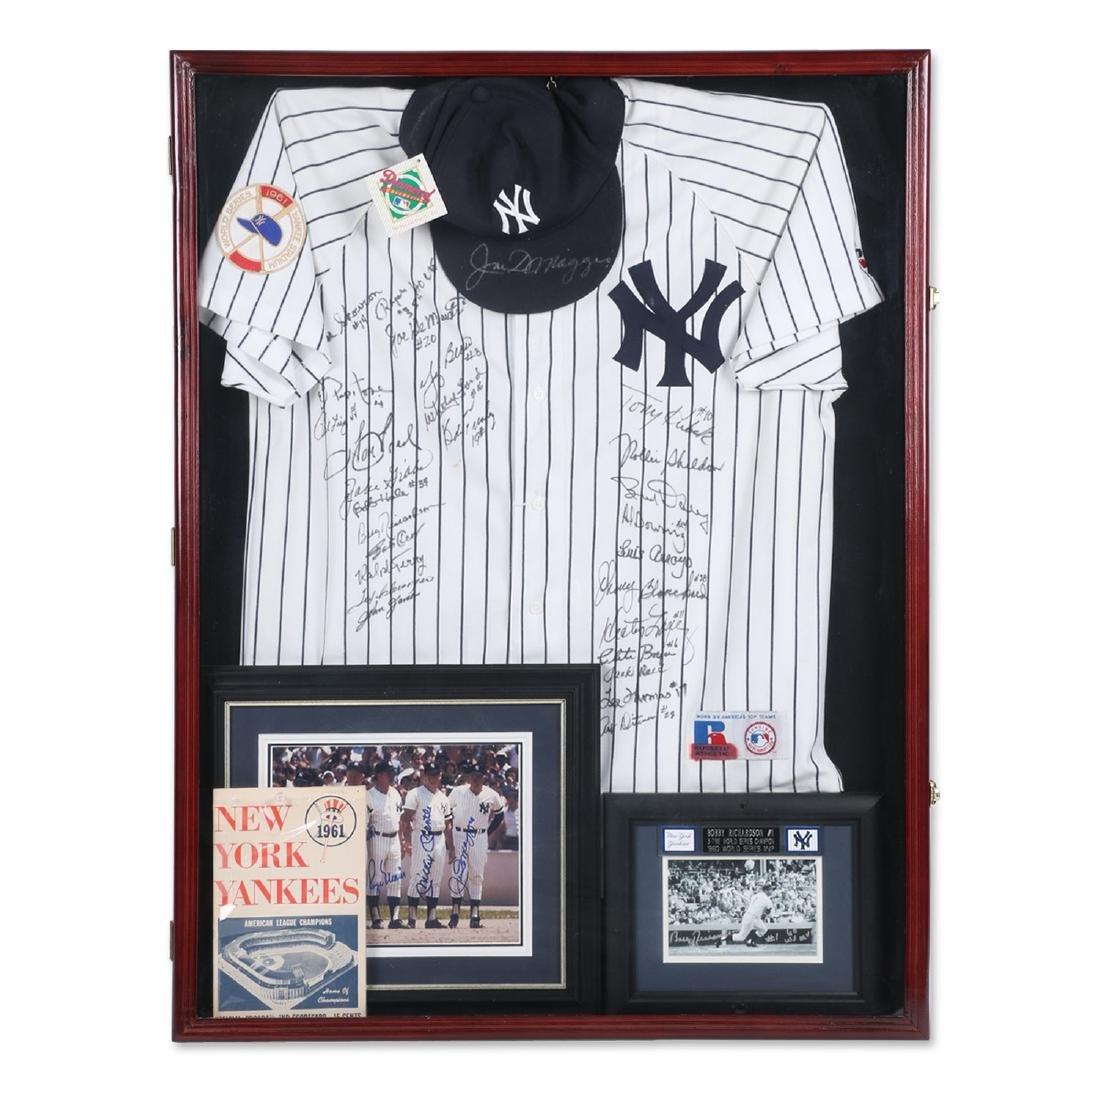 1961 Yankees Jersey, Program, Cap ++